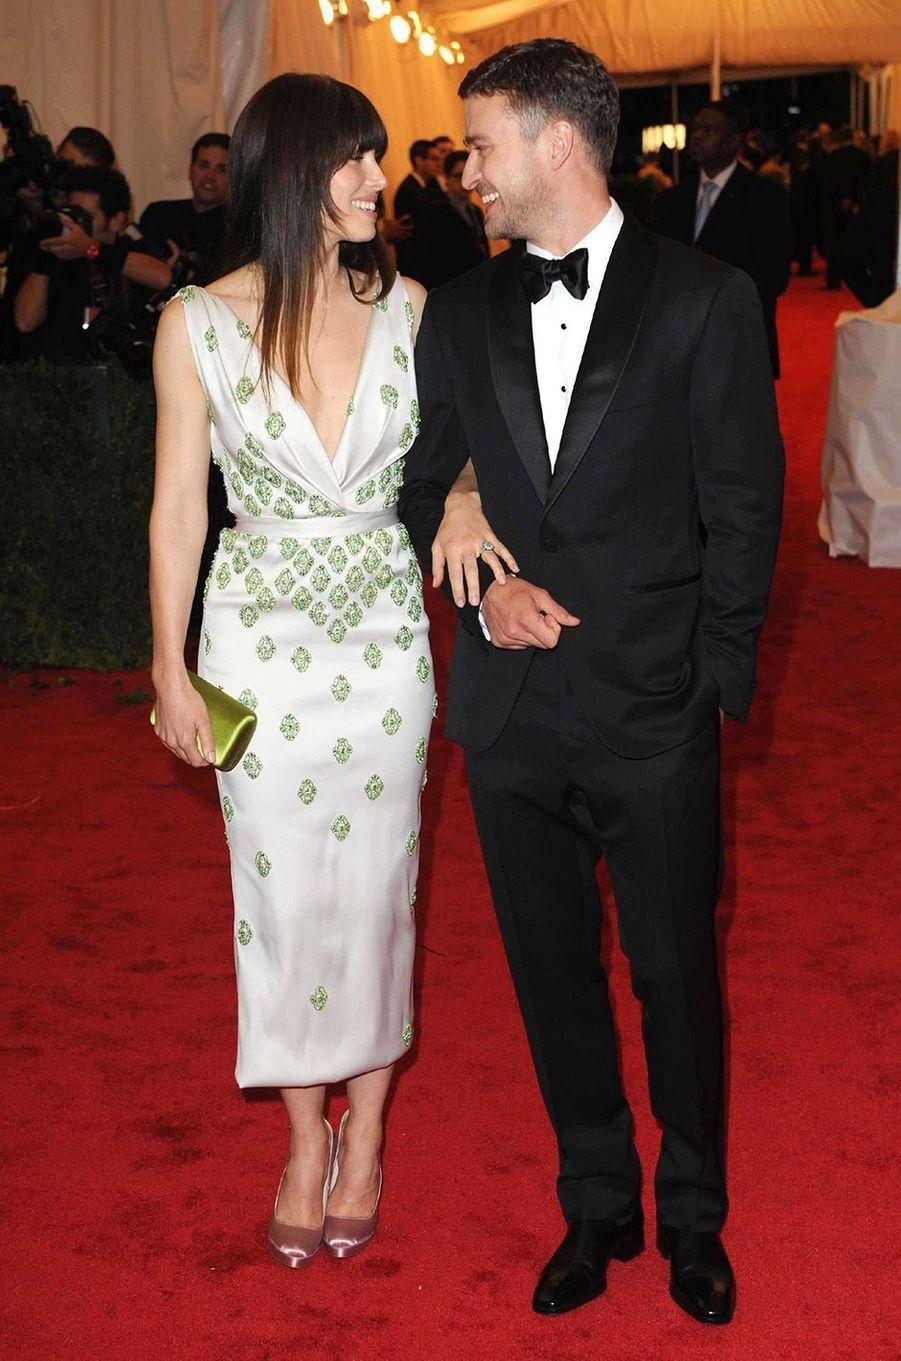 Justin Timberlake et Jessica Bielau Met Gala 2011.